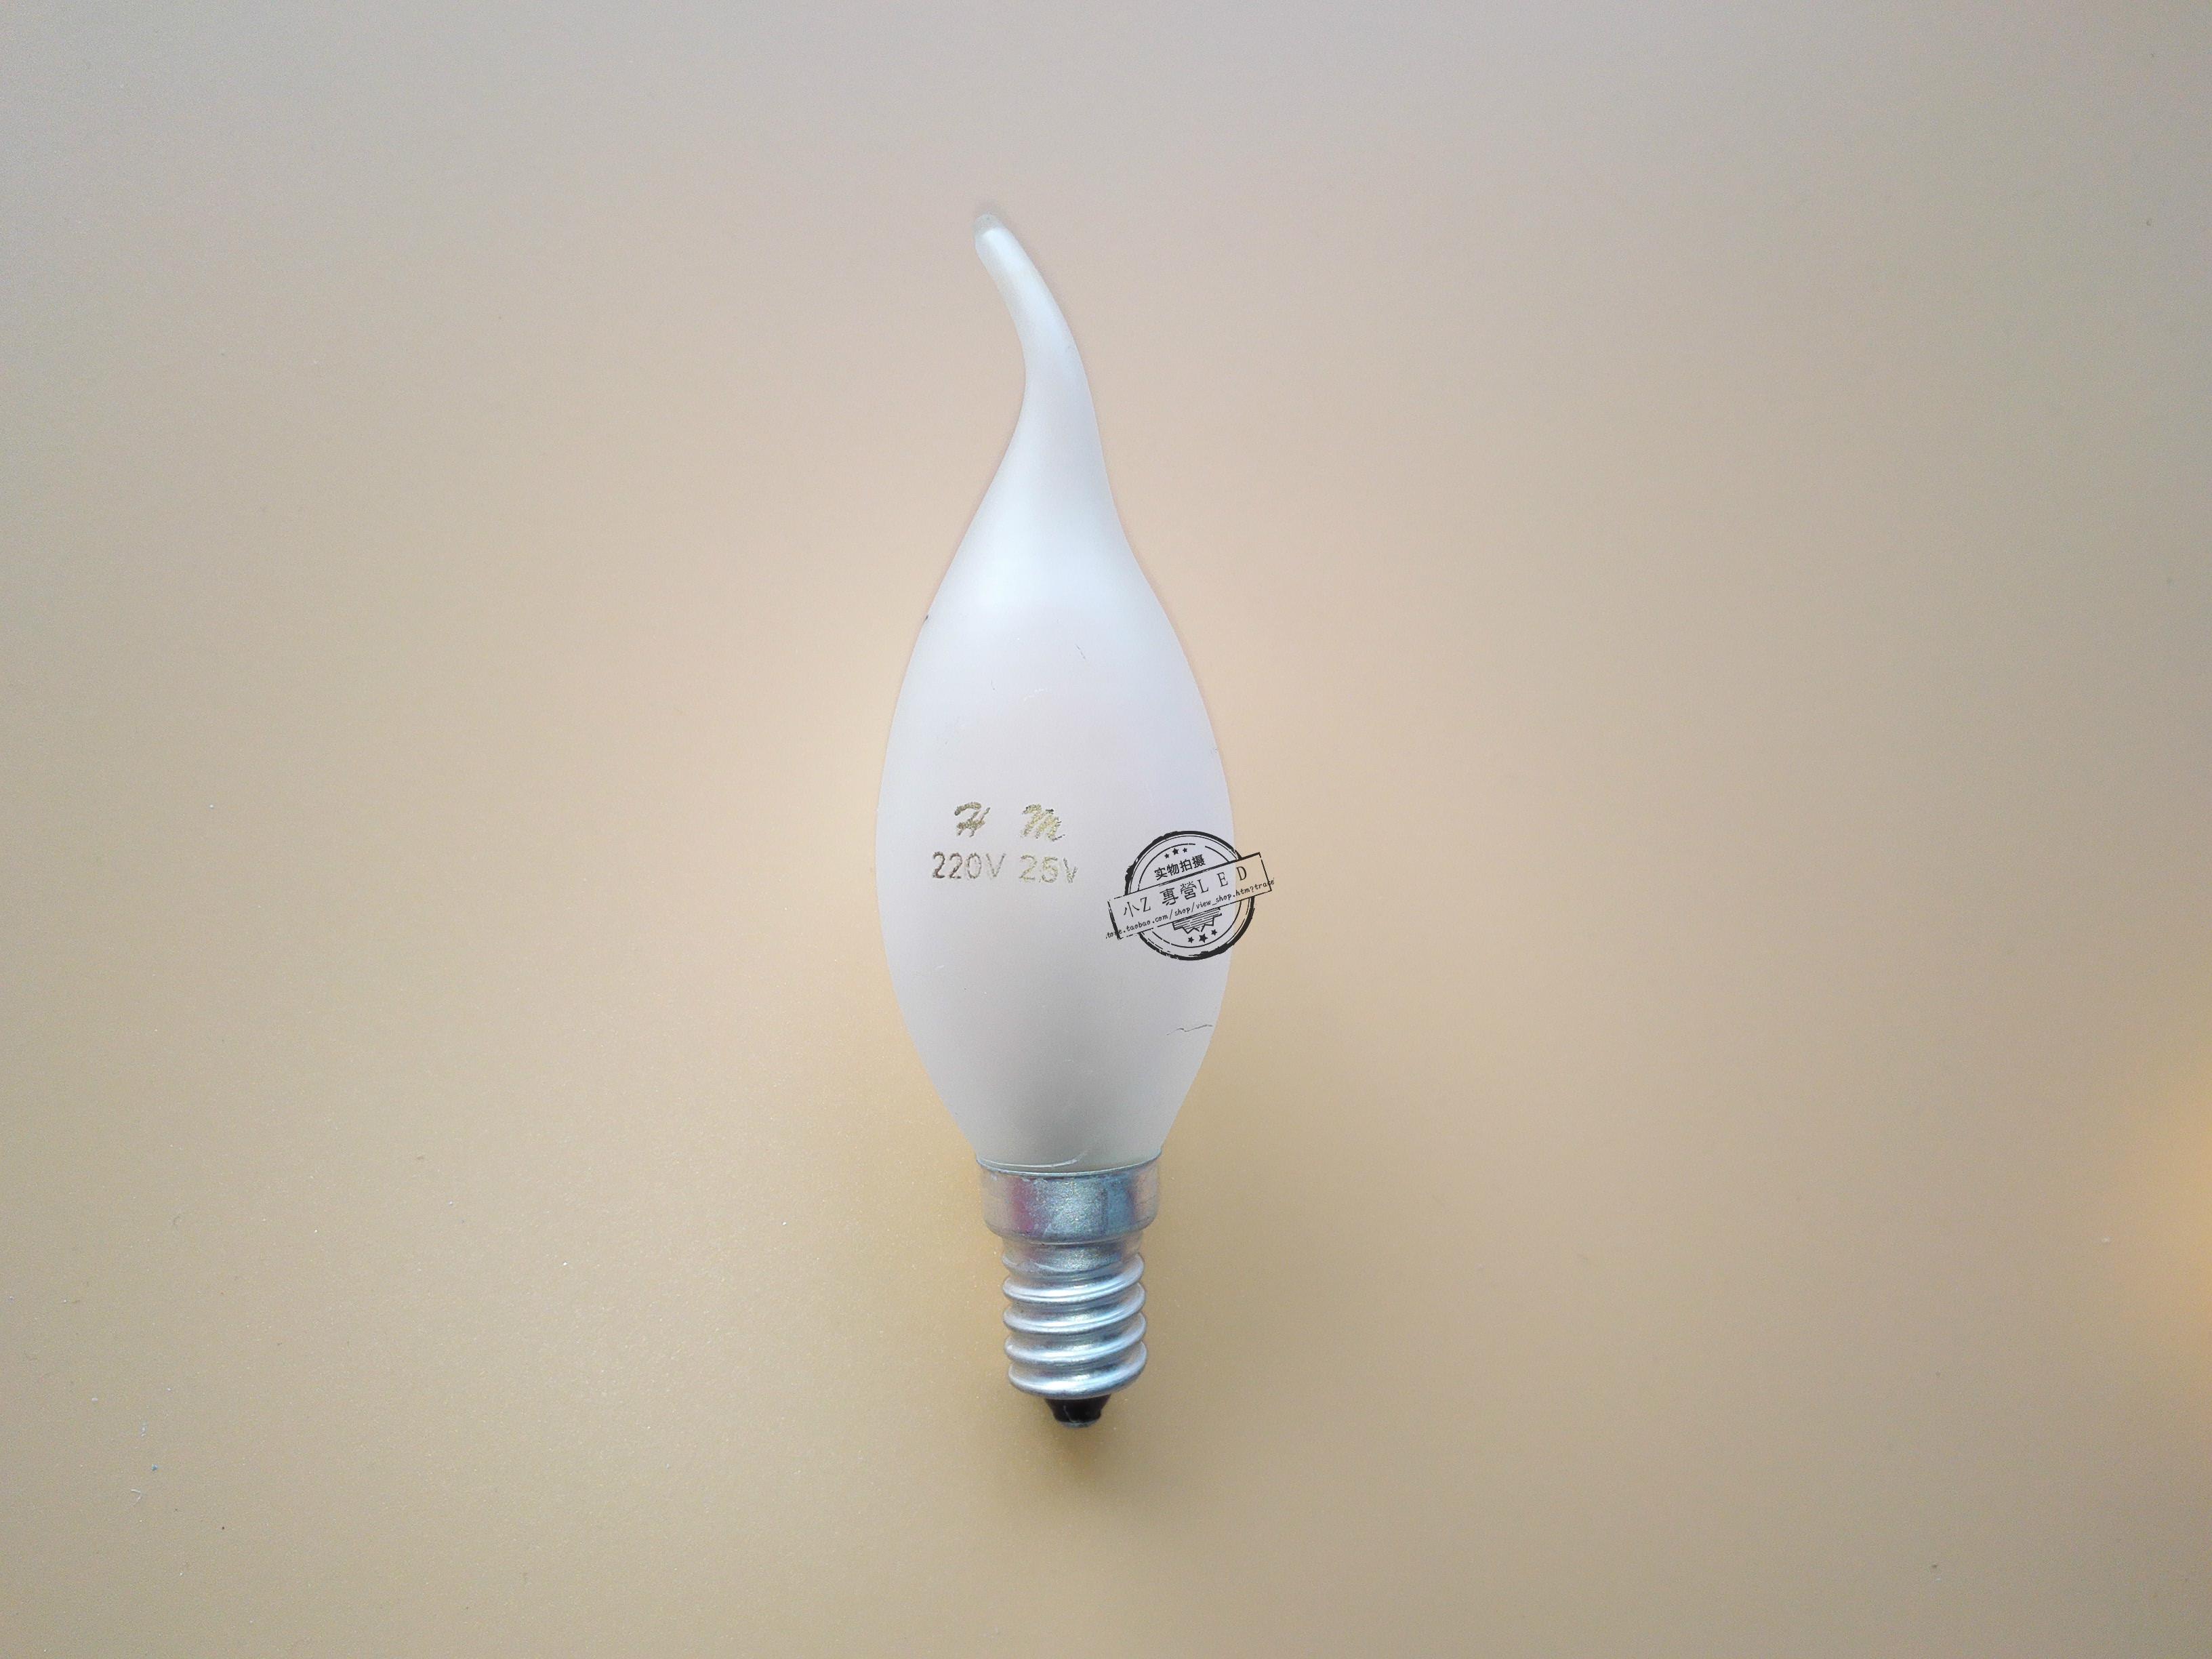 E14小螺口尖泡蜡烛泡钨丝灯泡照明光源 5w水晶灯专用装饰灯泡